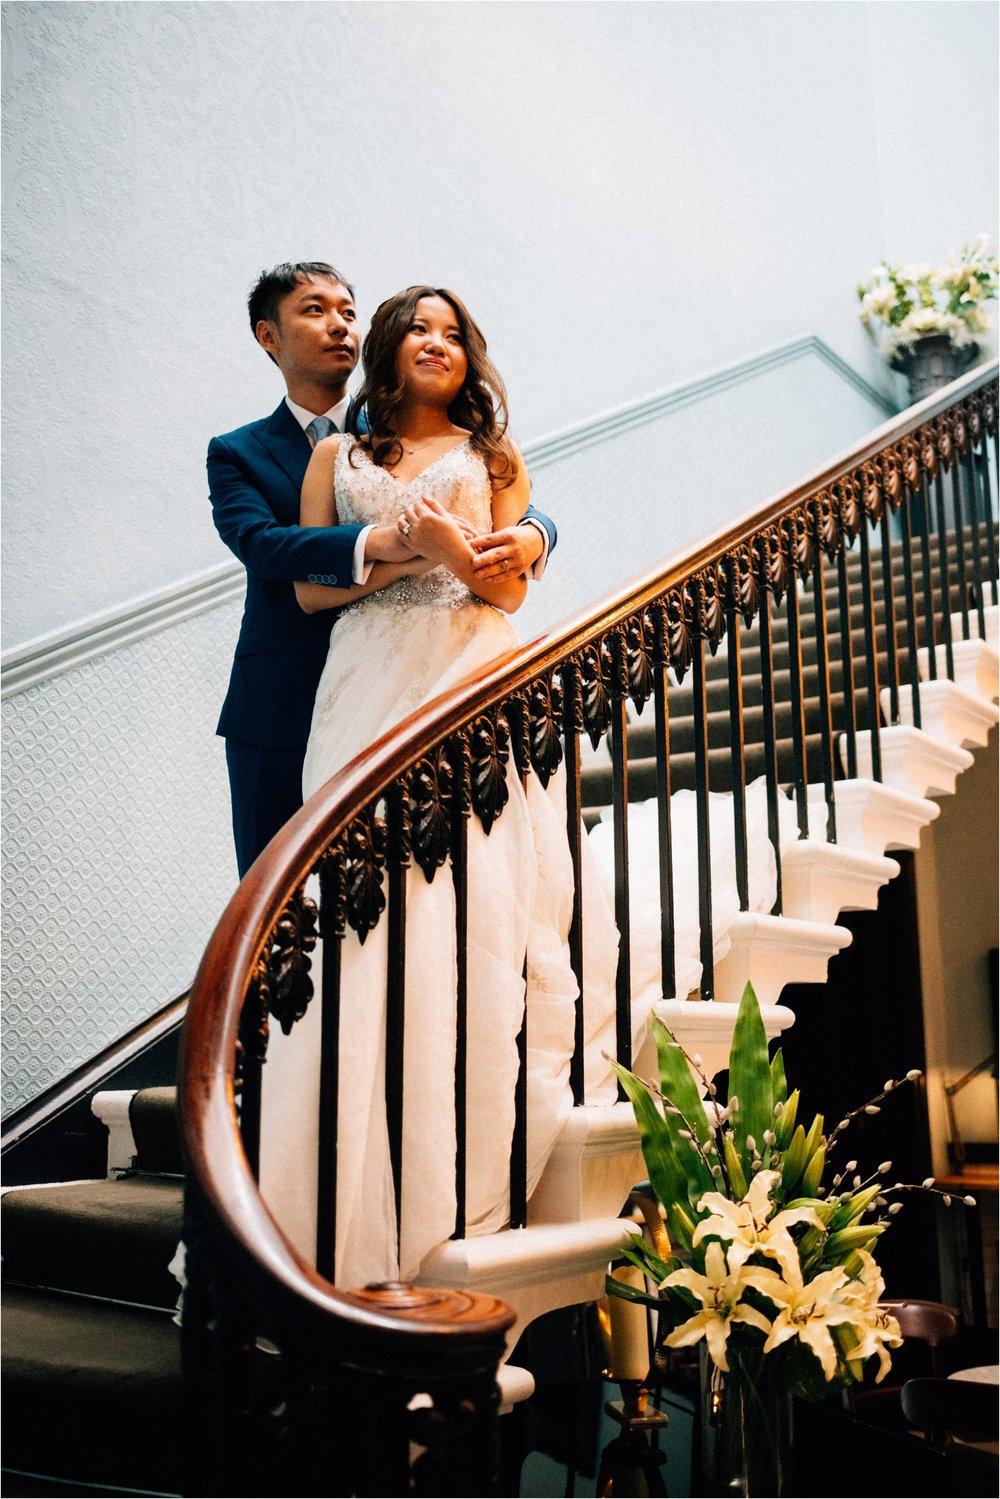 York city elopement wedding photographer_0019.jpg